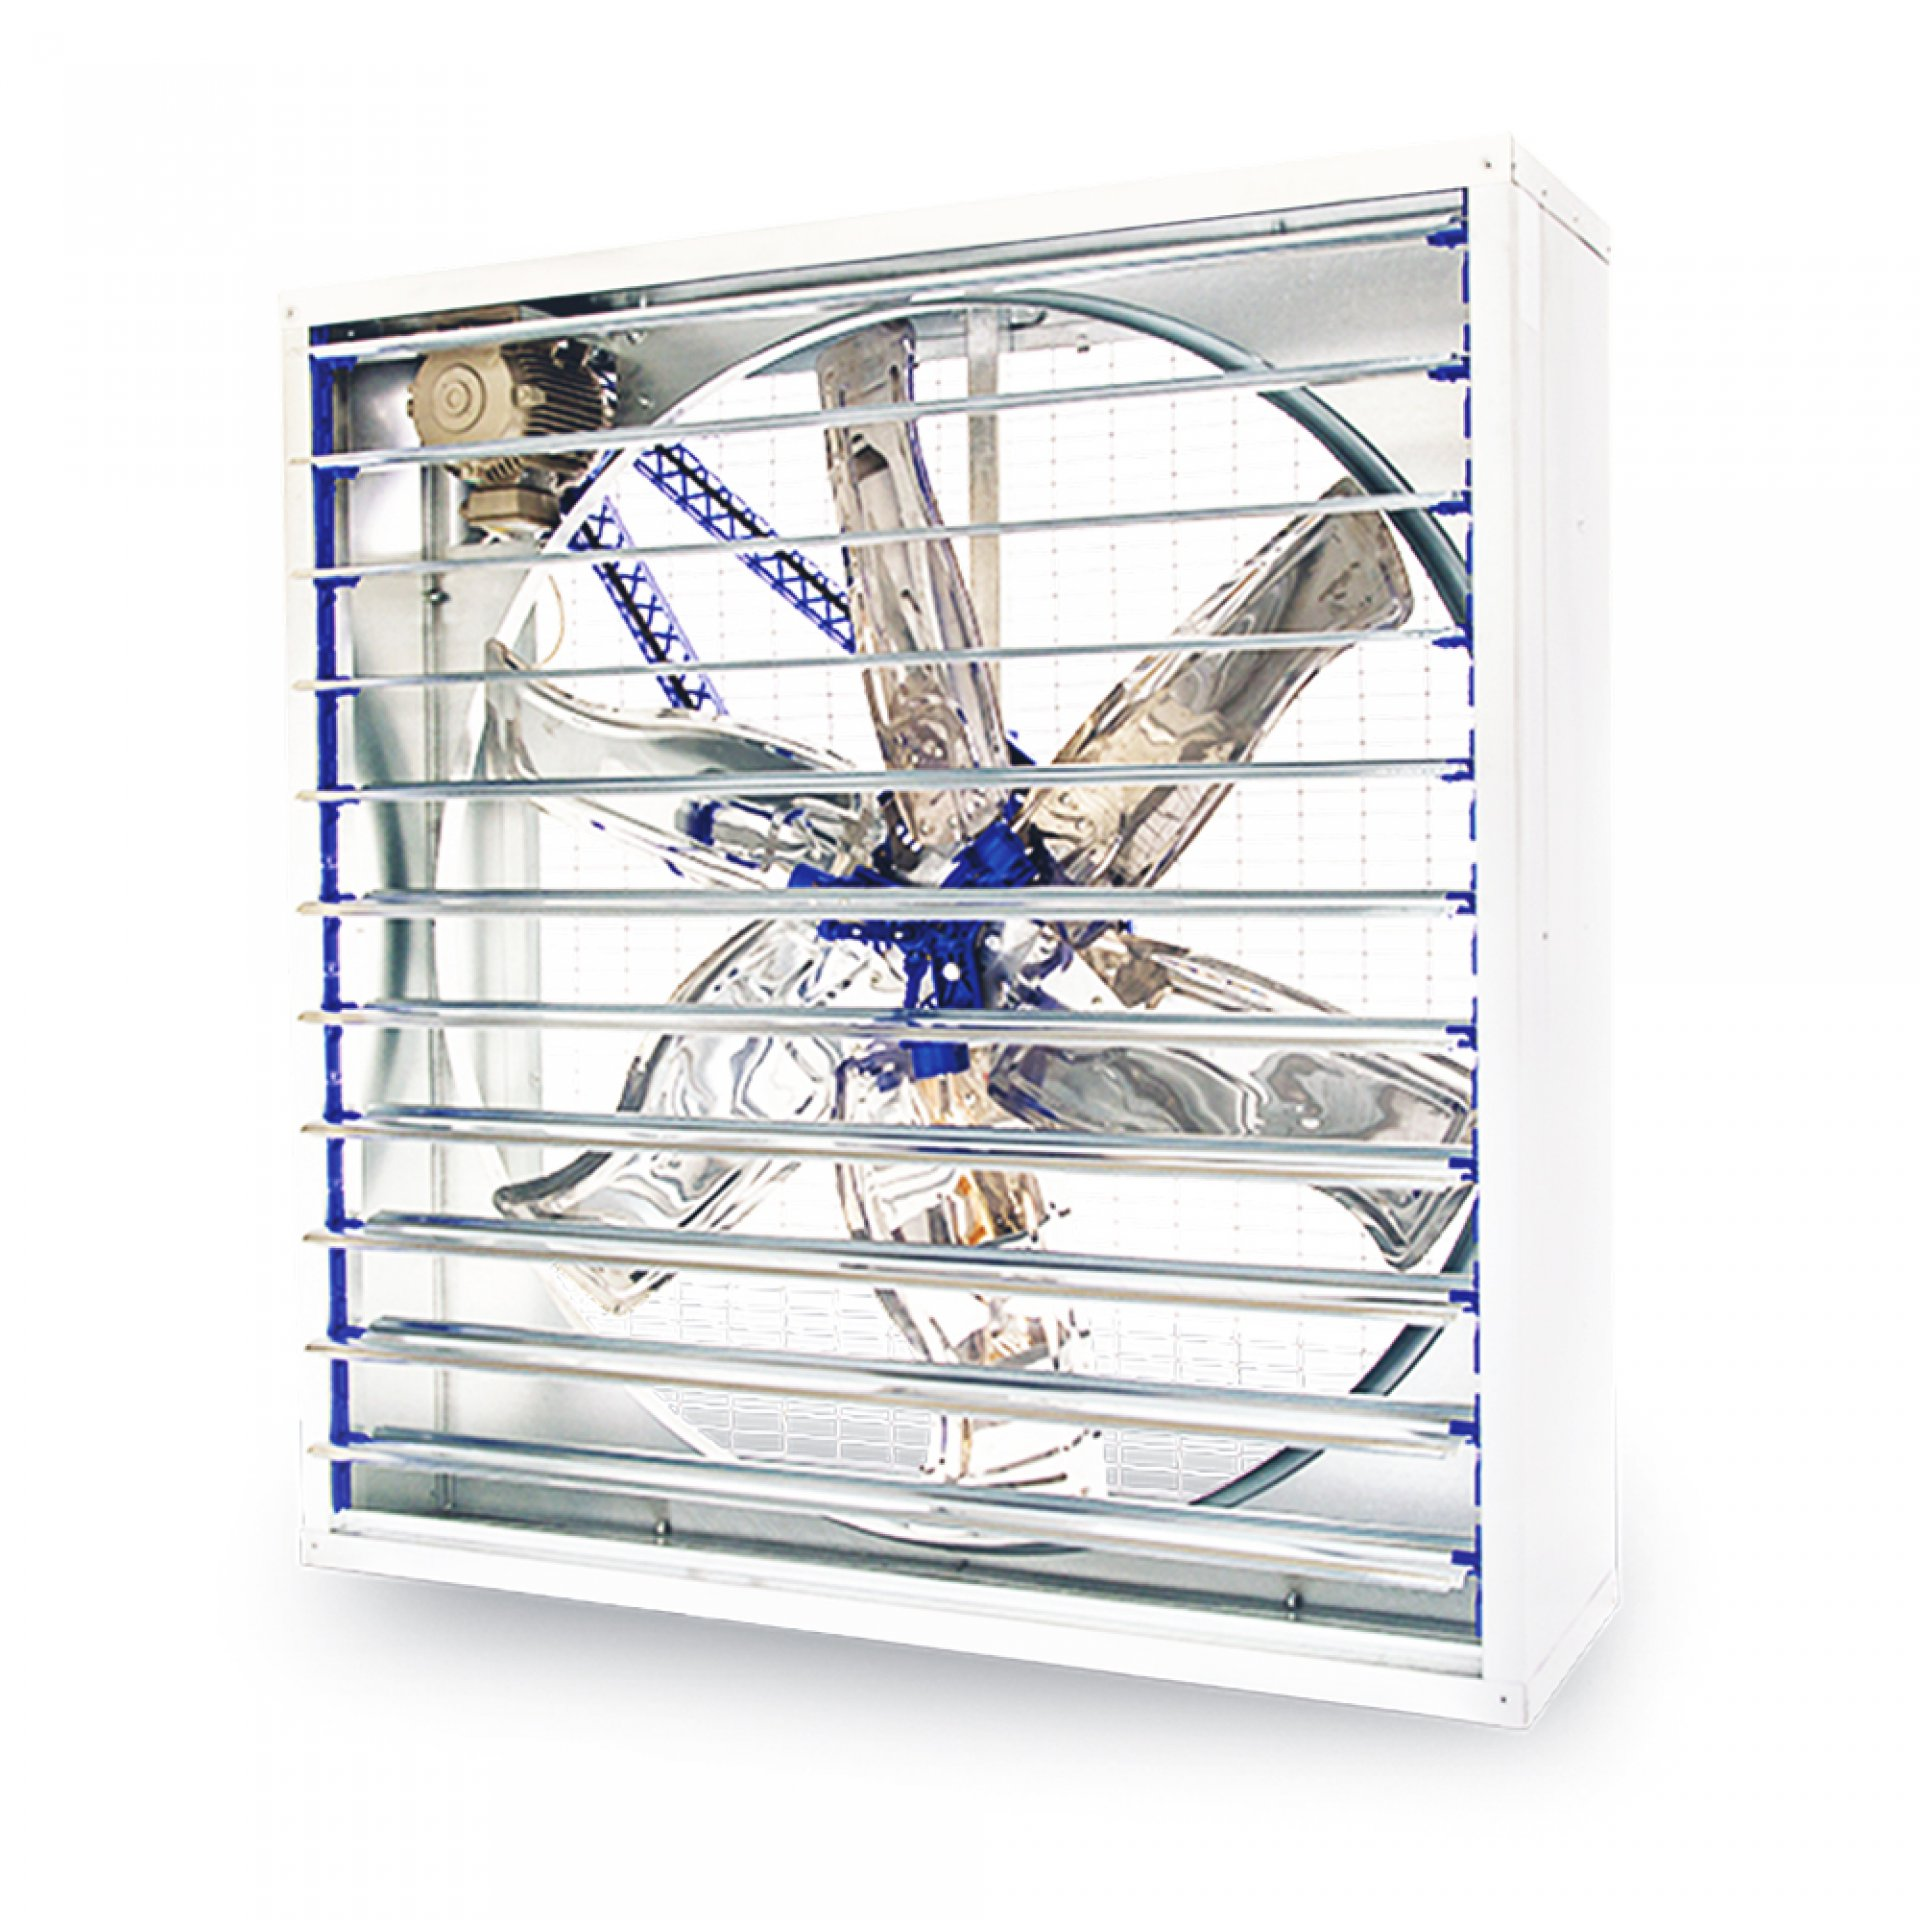 1270-louvered-grill-ventilation-fan